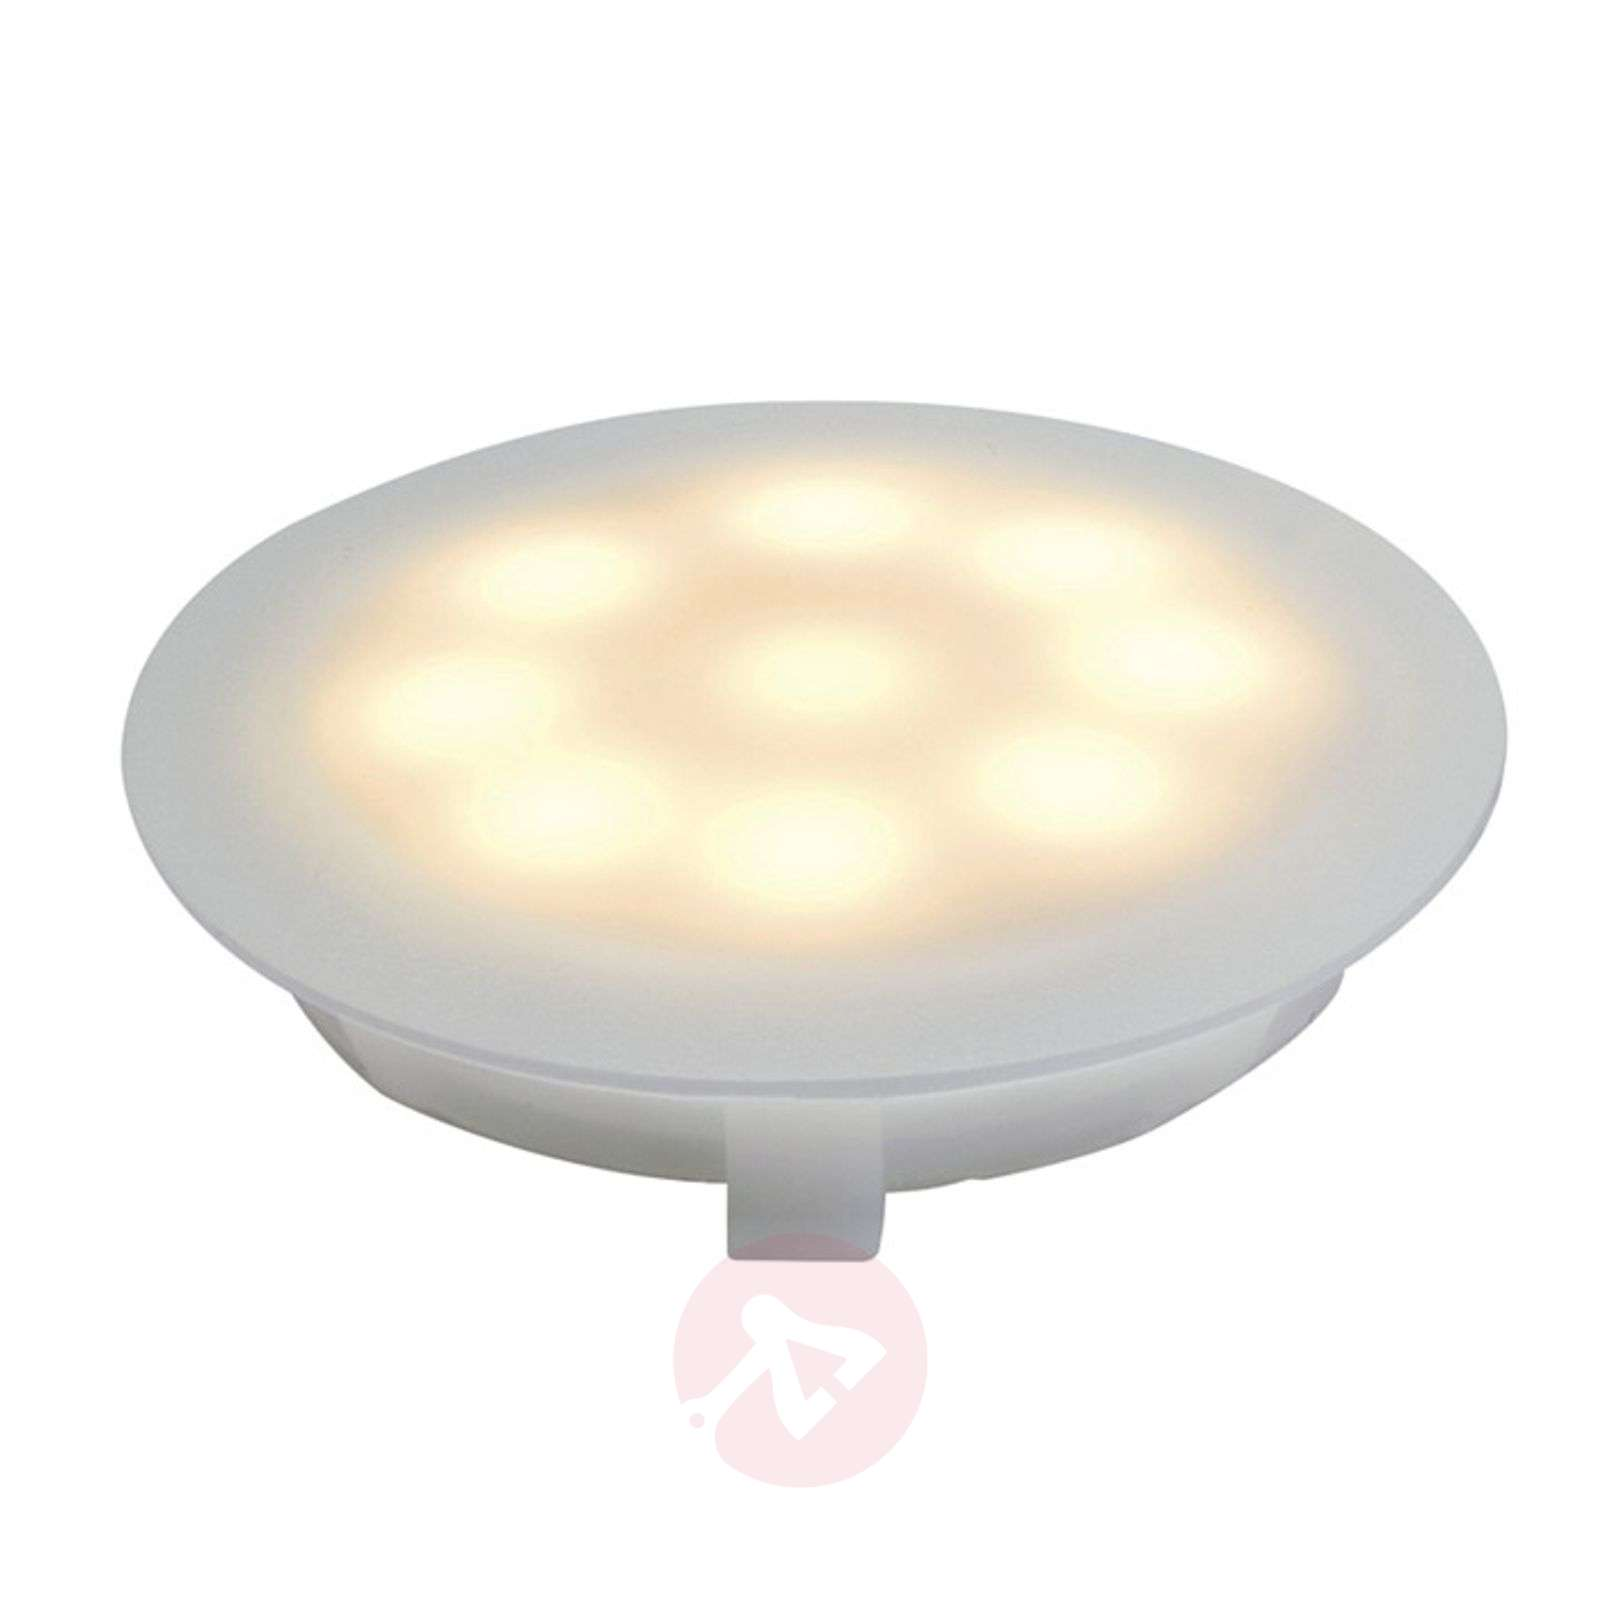 LED satin-finished recessed light, 1 W warm white-7600512-01